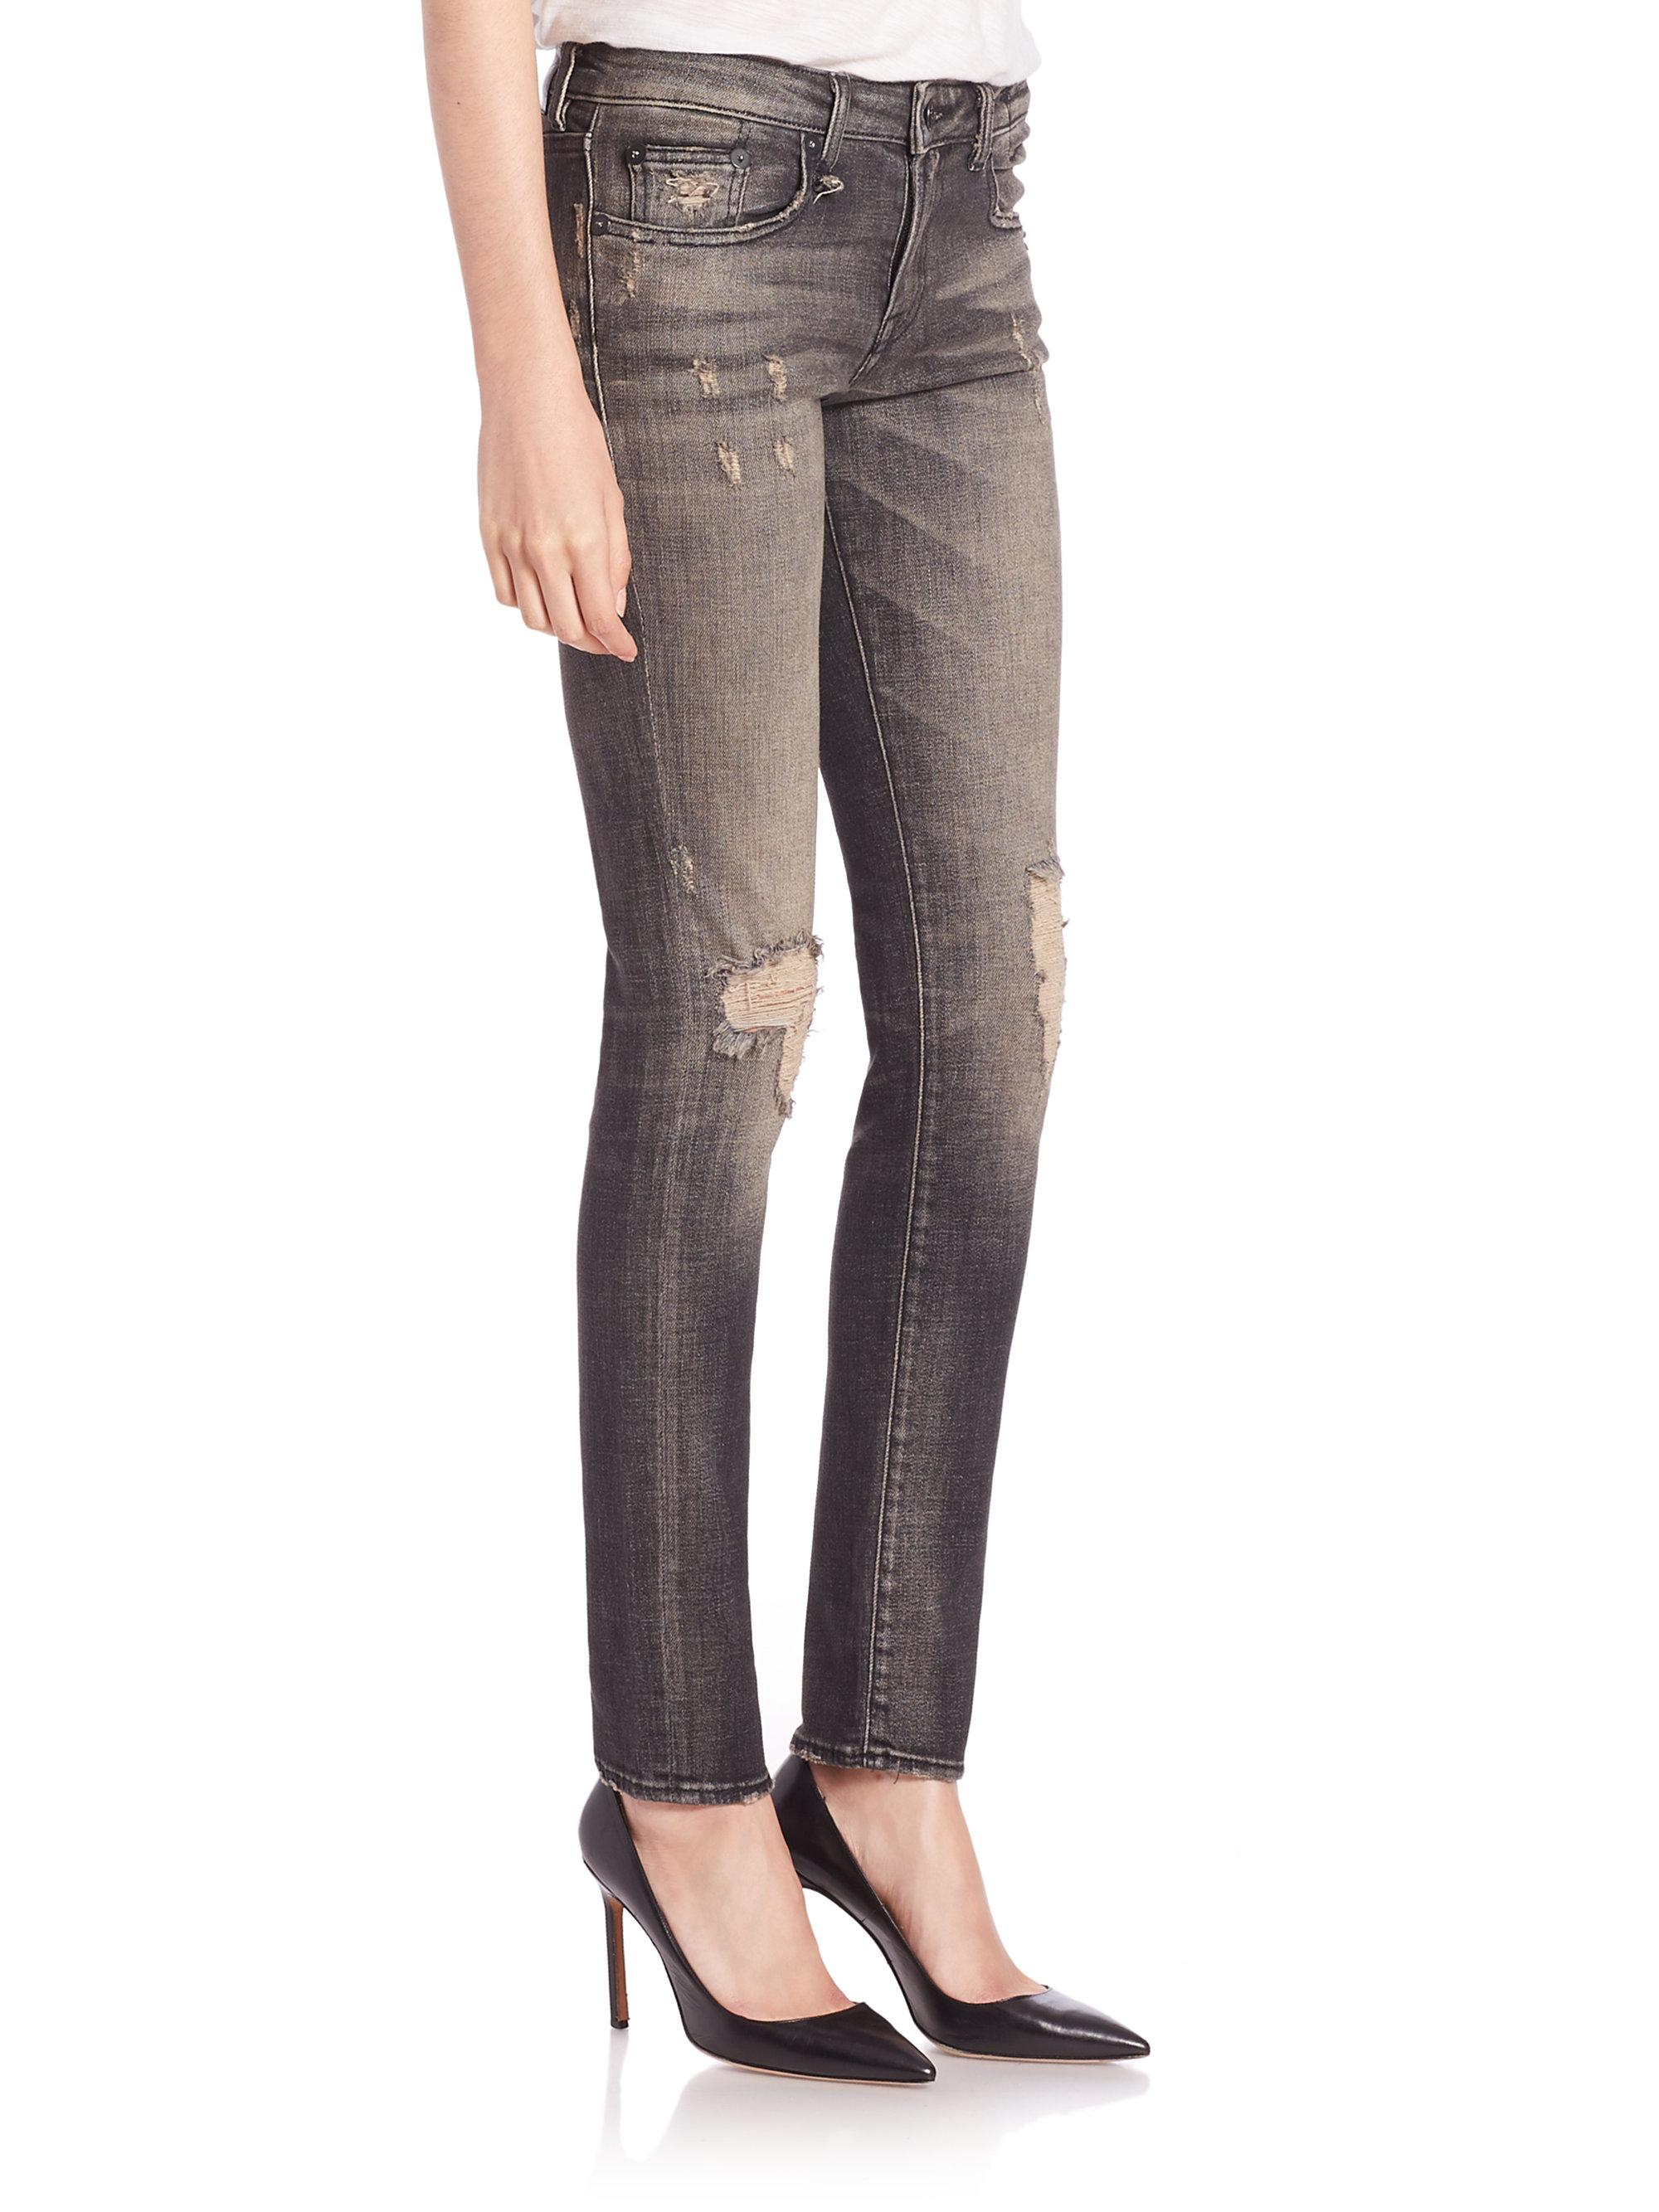 R13 Alison Distressed Skinny Jeans in Black | Lyst